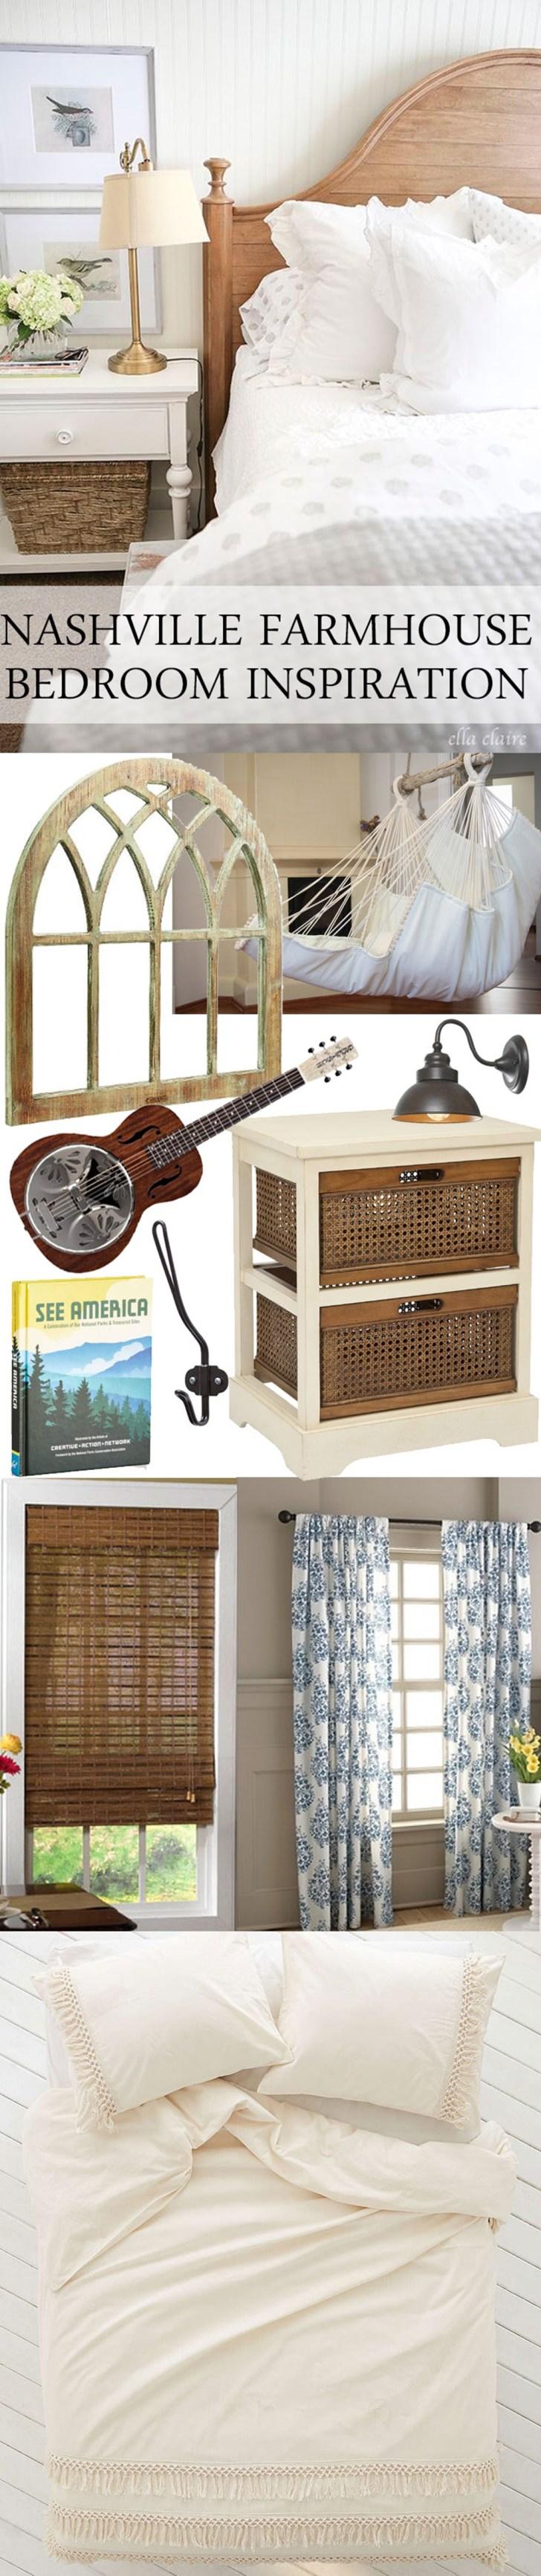 Nashville-Farmhouse-Master-Bedroom